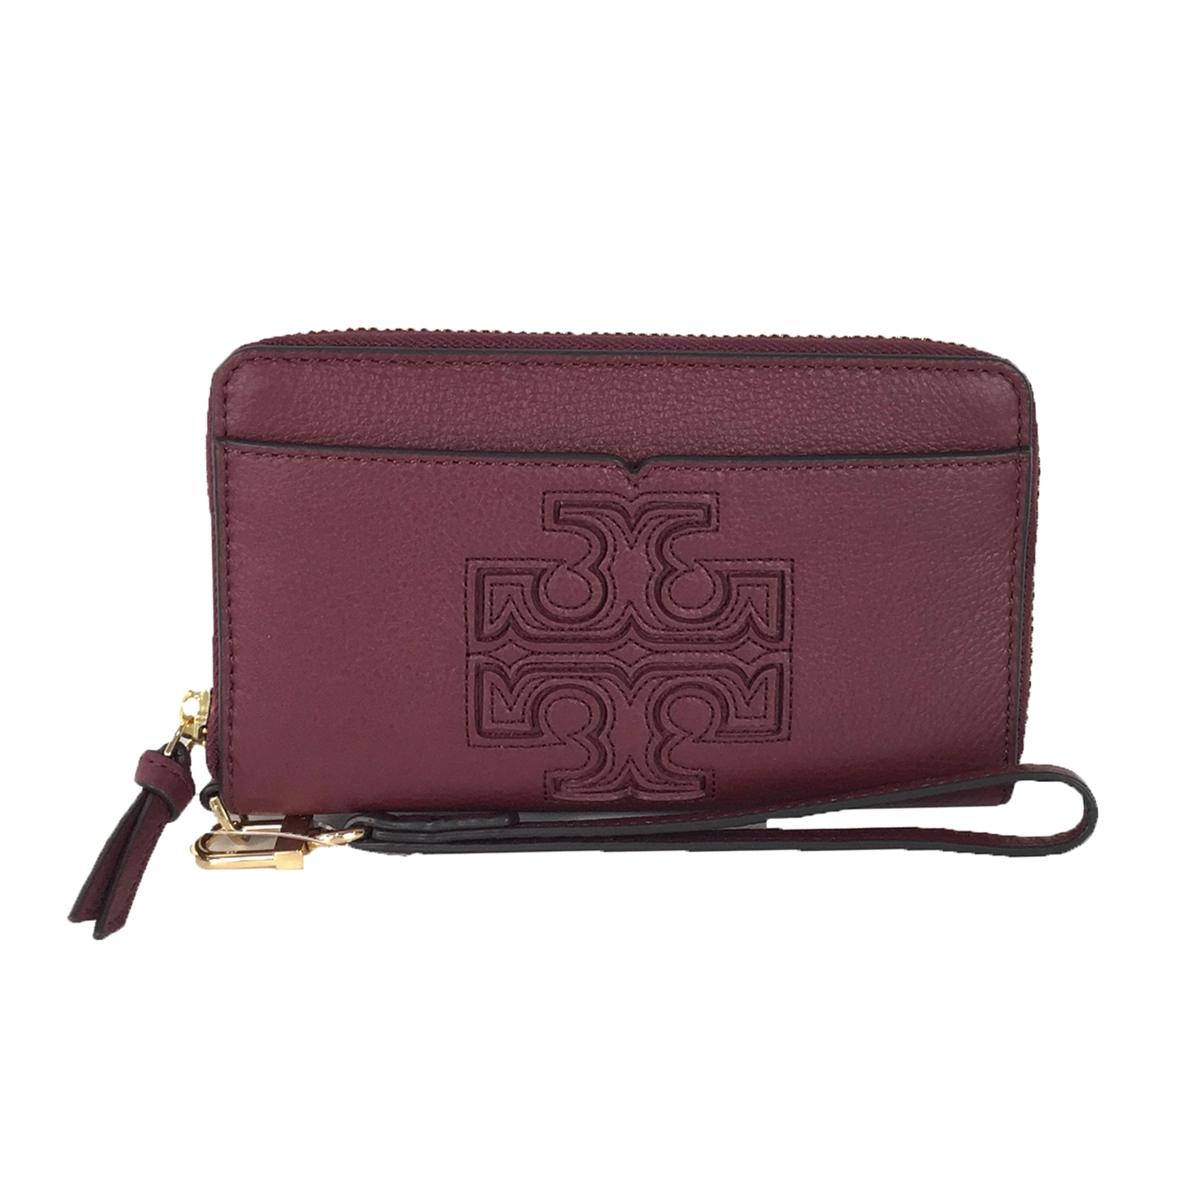 aa22d266159a9 Tory Burch Harper iPhone 7   6 Leather Wristlet Wallet